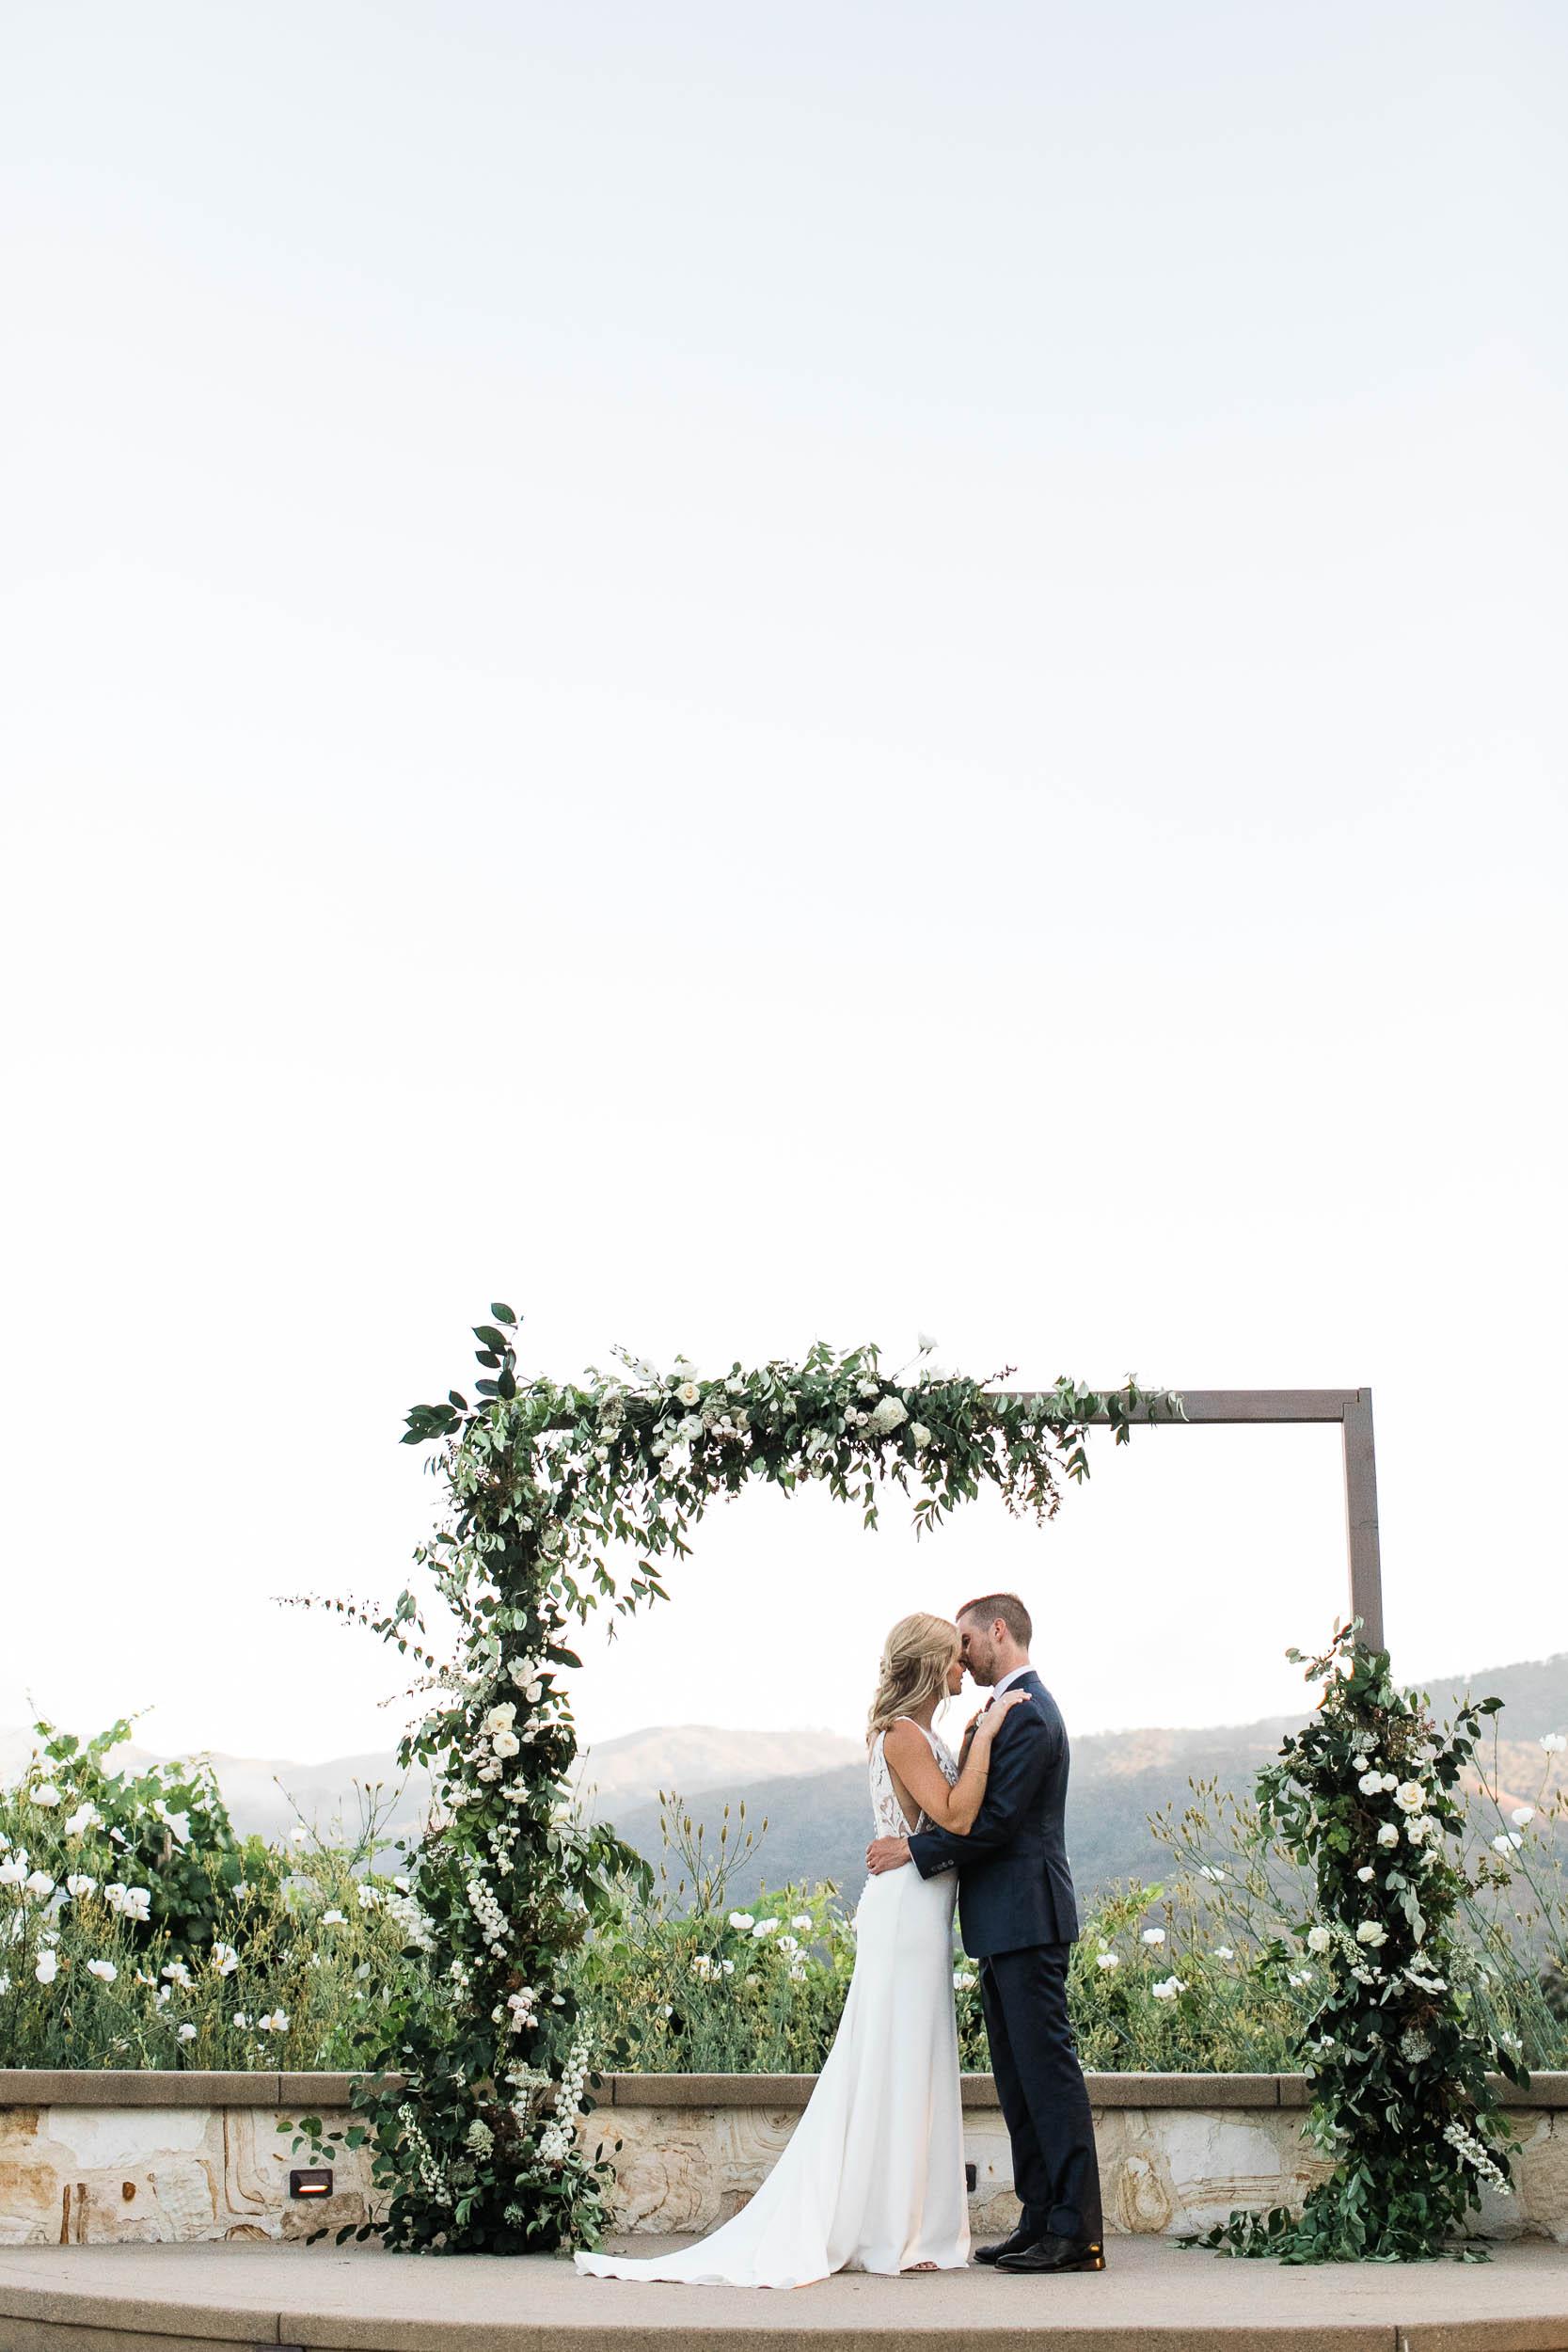 119_072118_D+K_Holman Ranch Wedding_Buena Lane Photography_1482ER.jpg